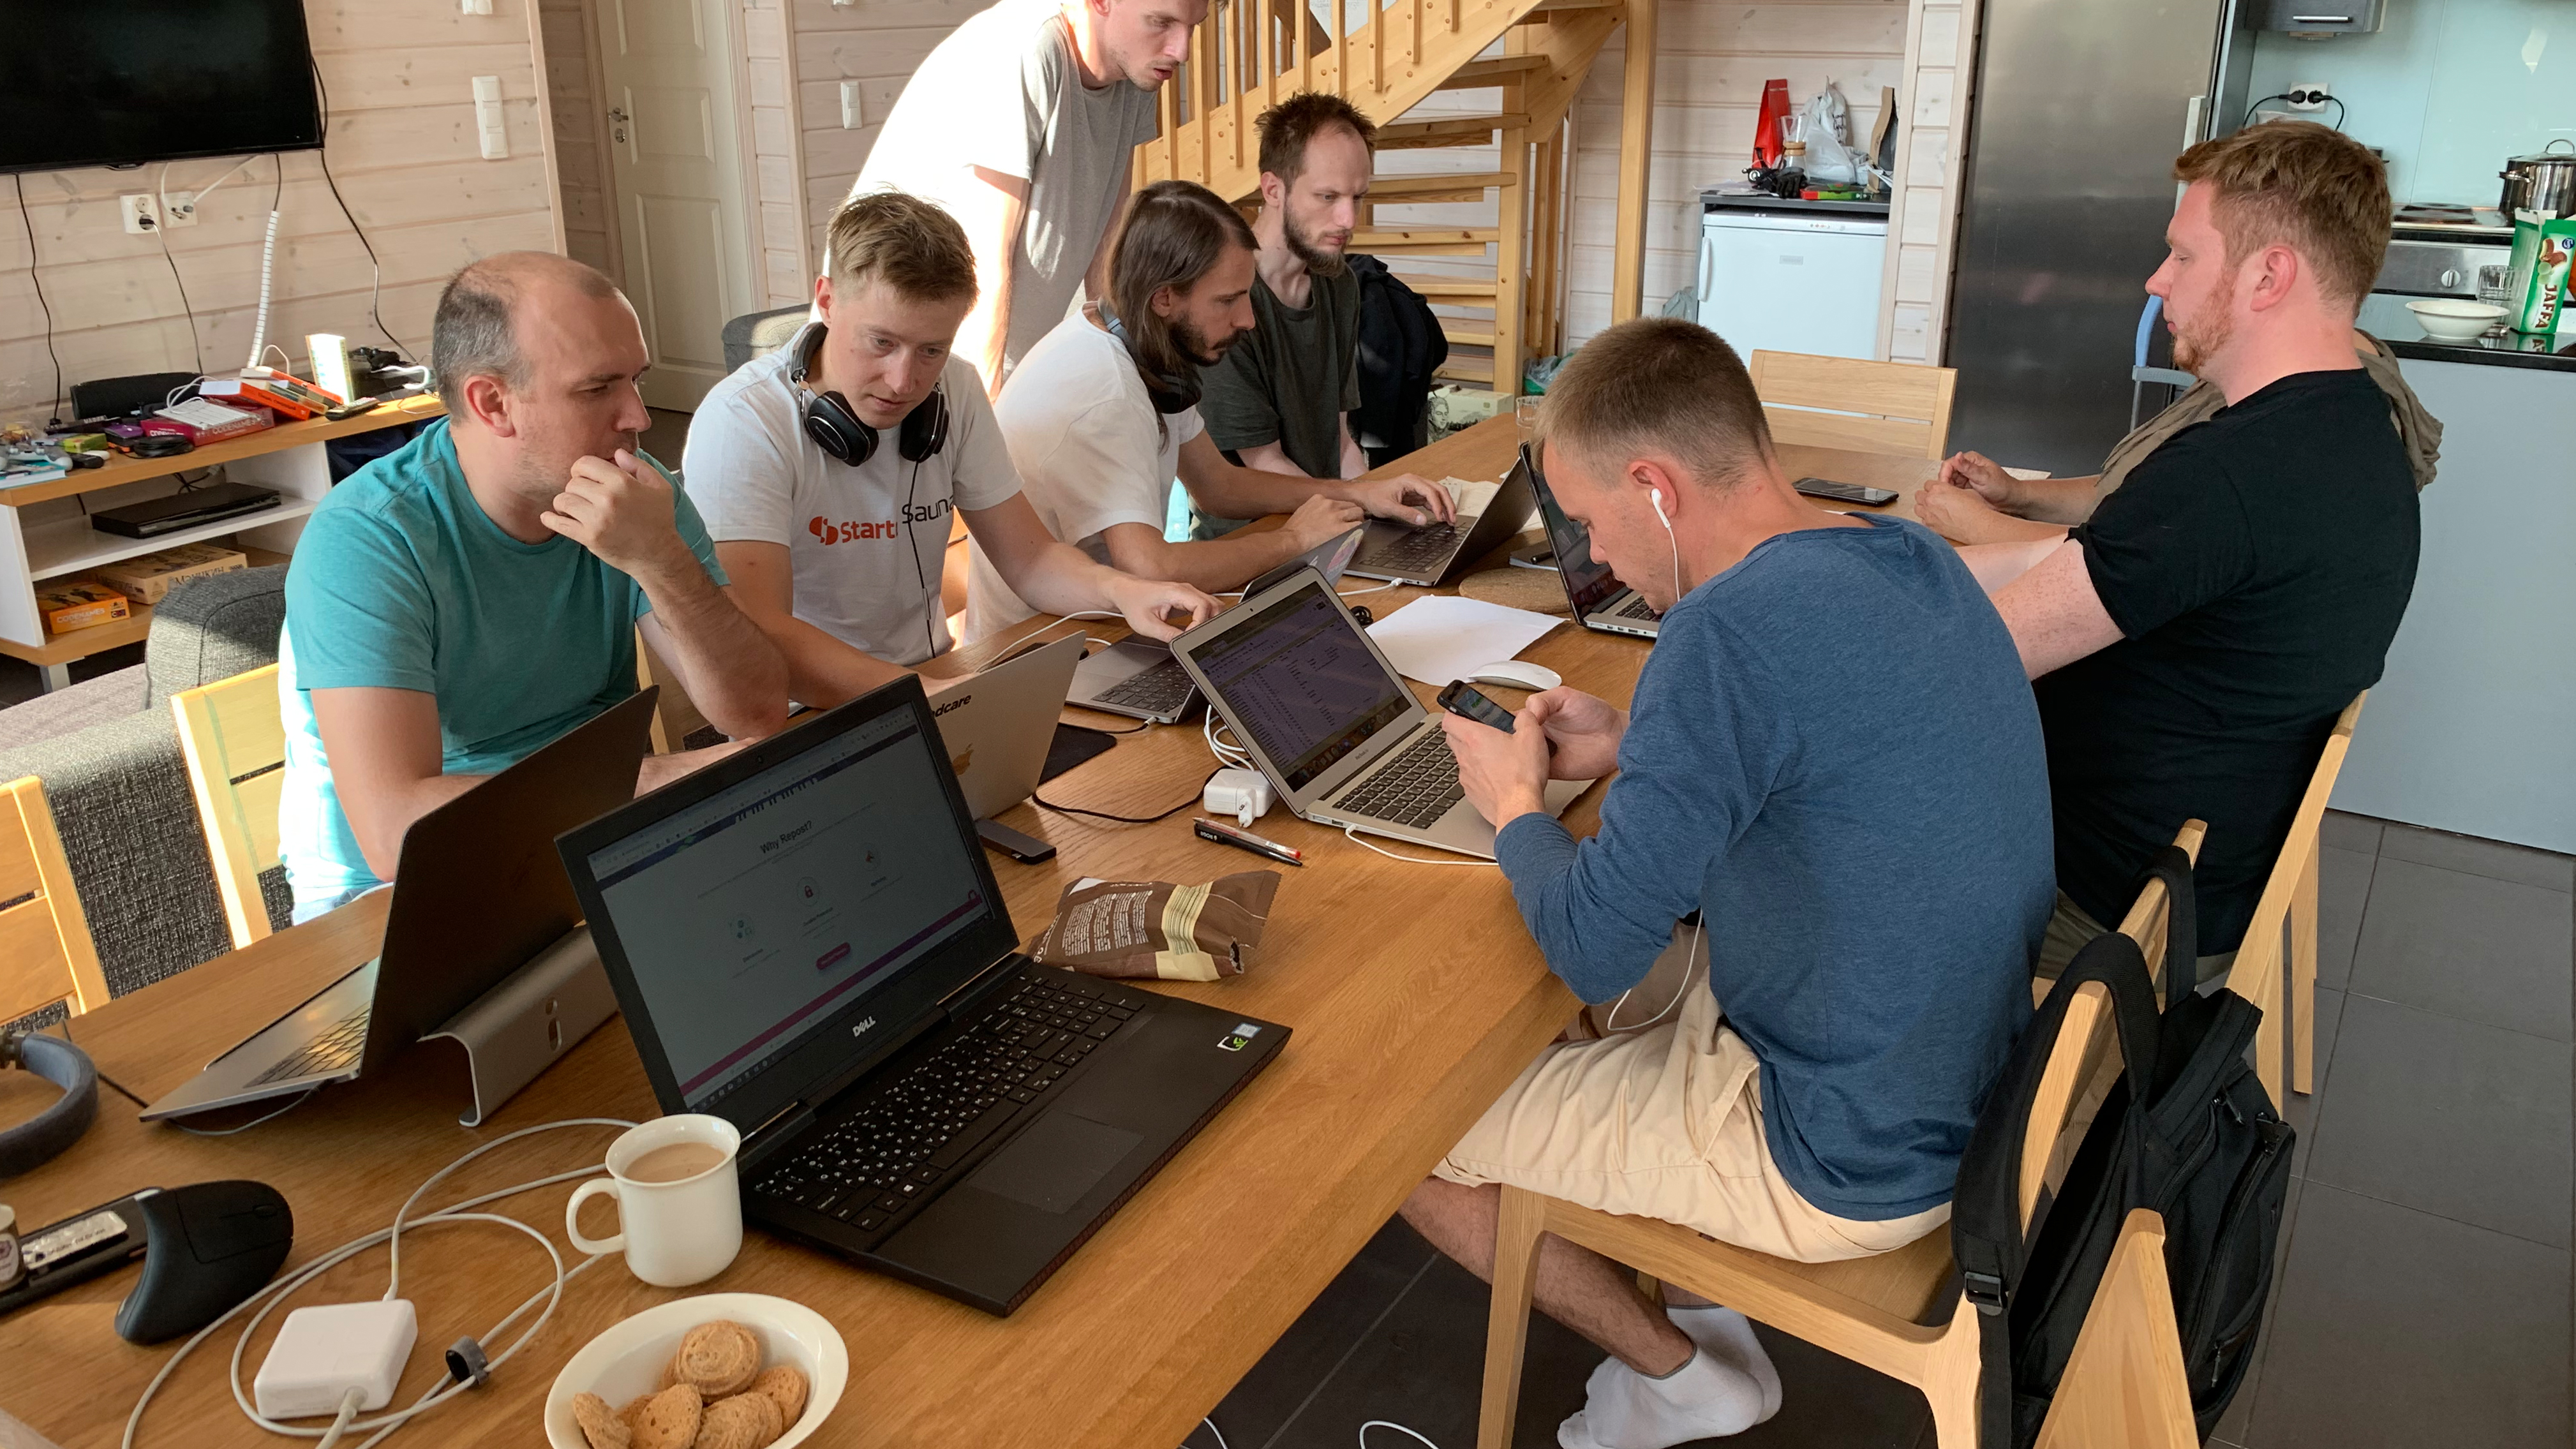 Uploadcare team meeting